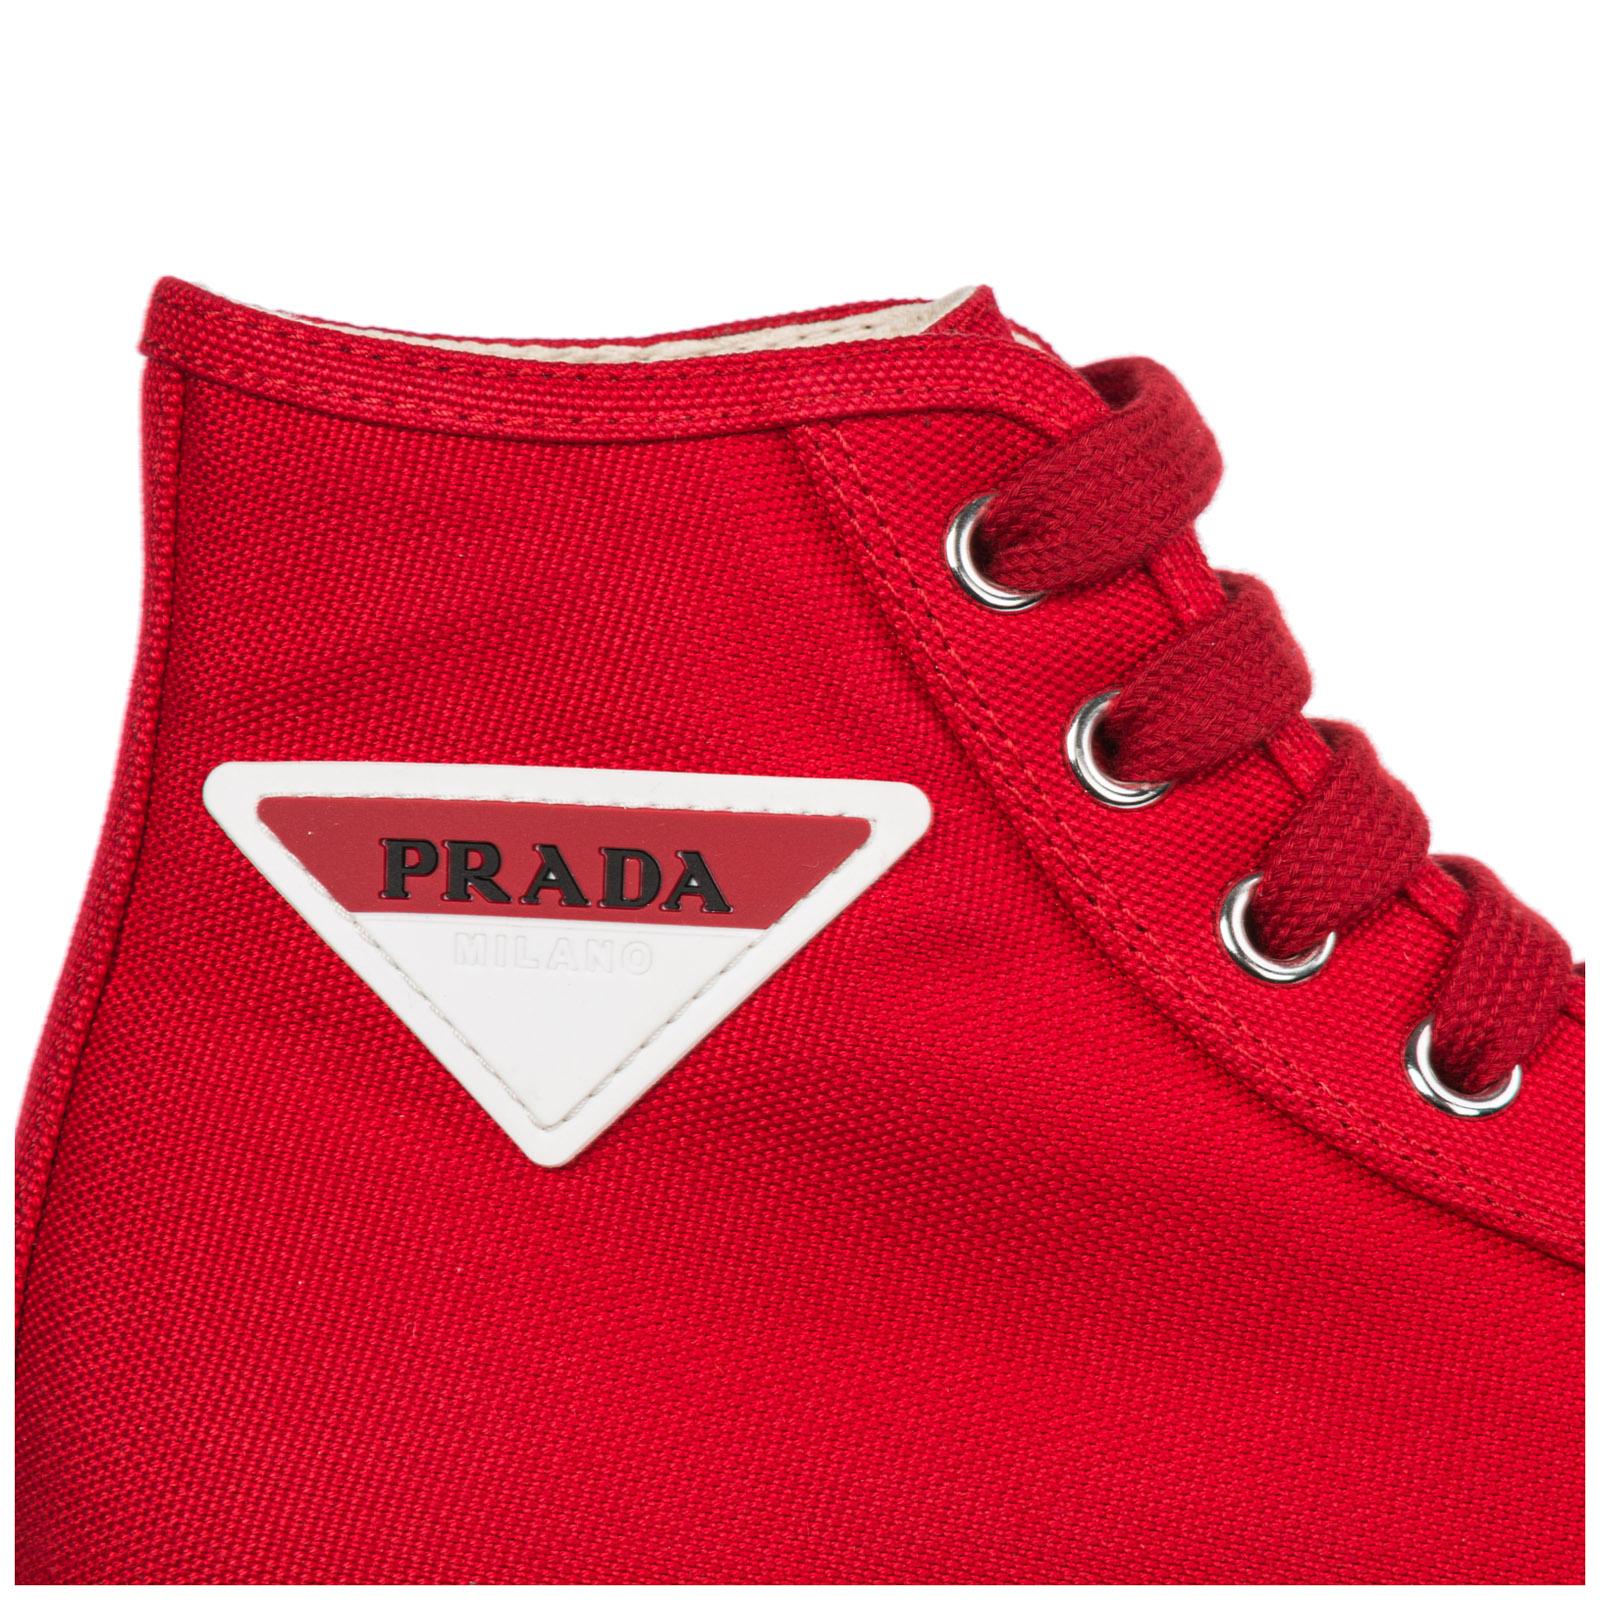 prada high top trainers